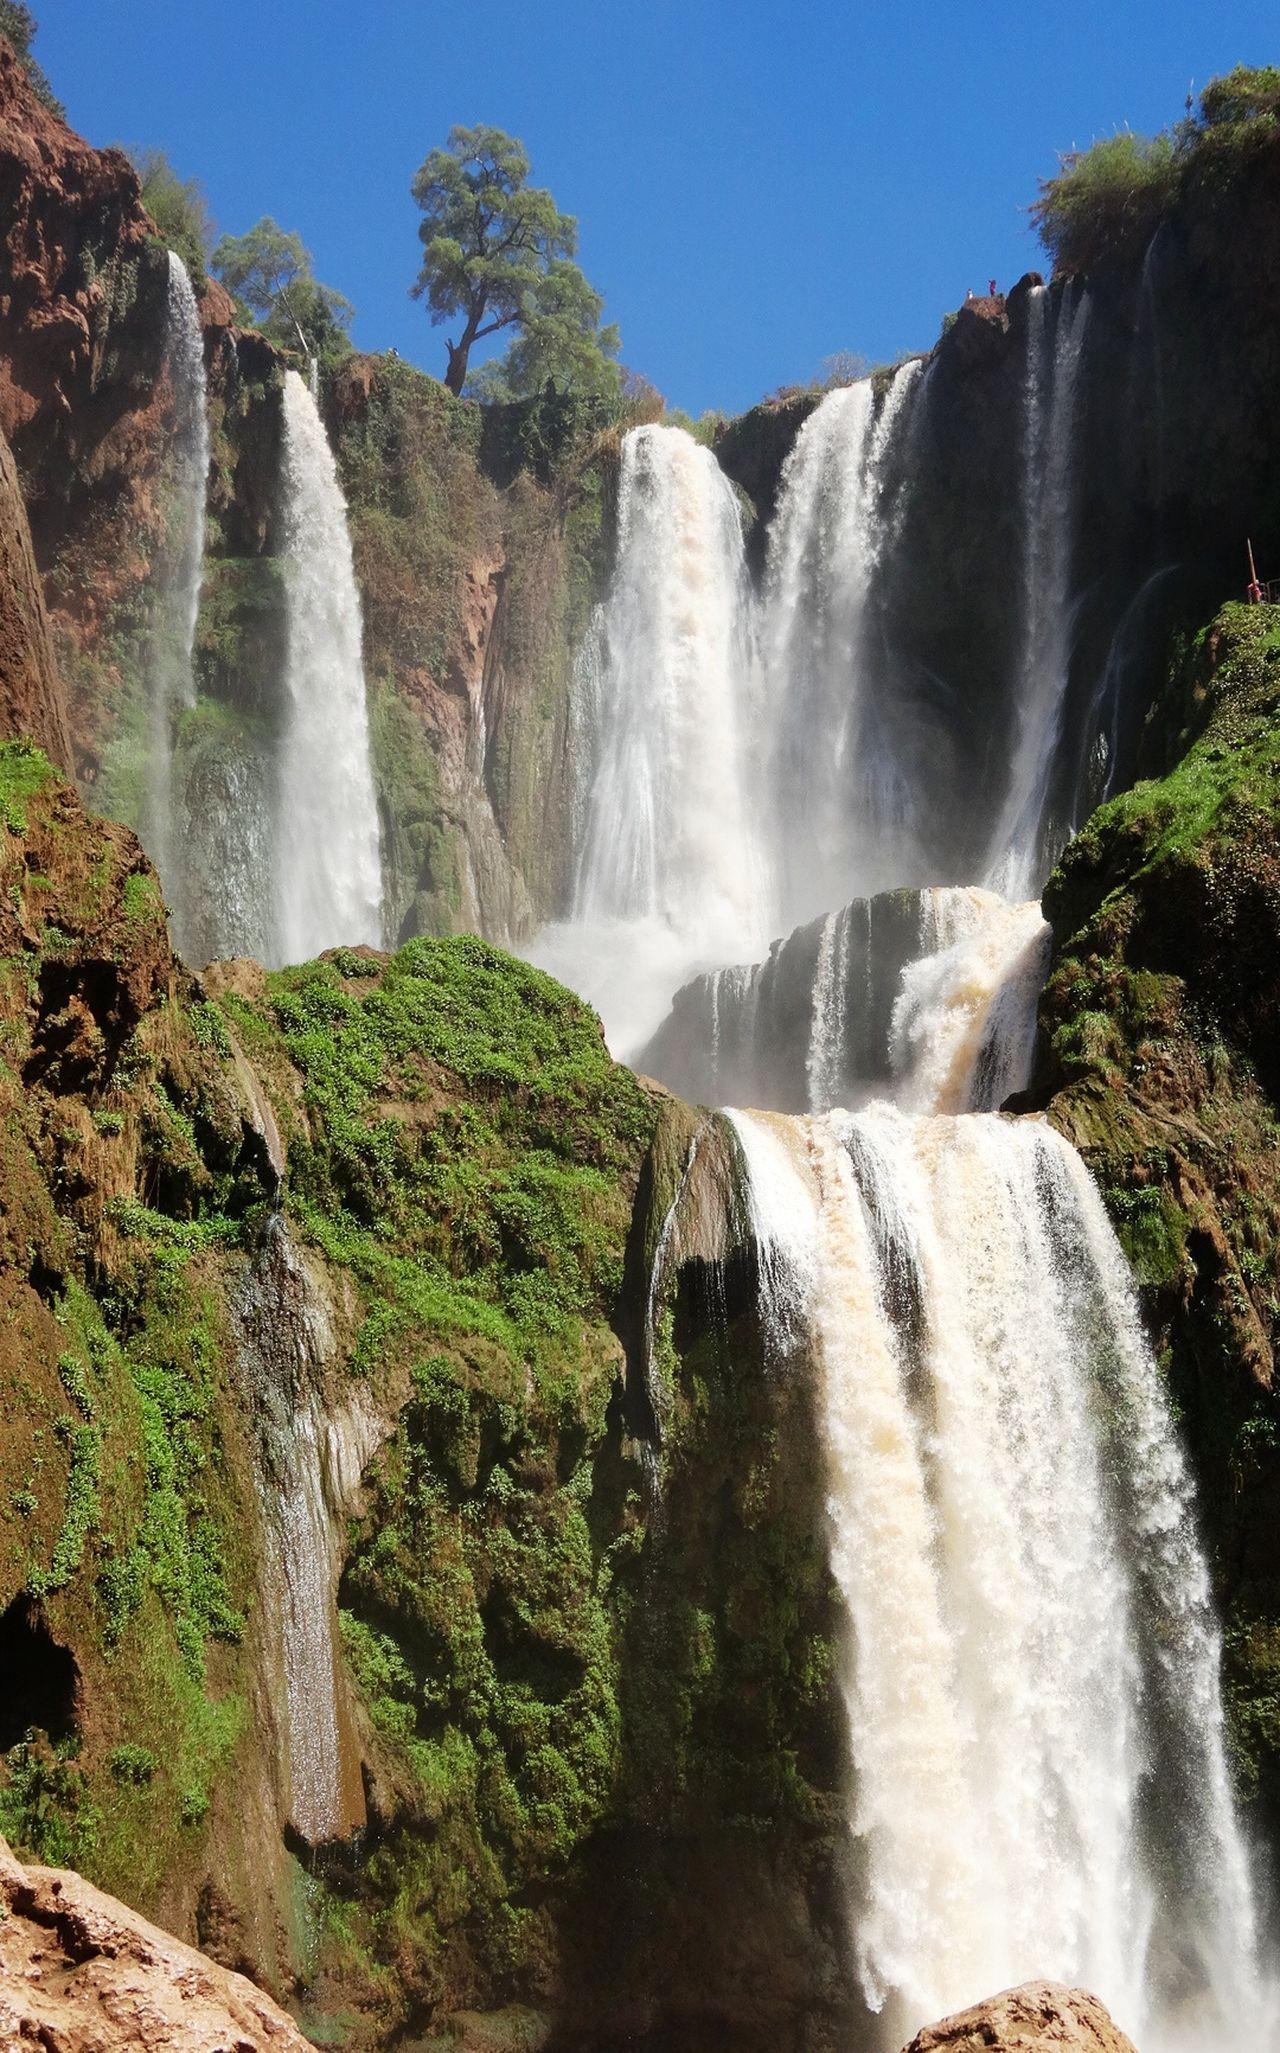 Ouzoud Falls Waterfall